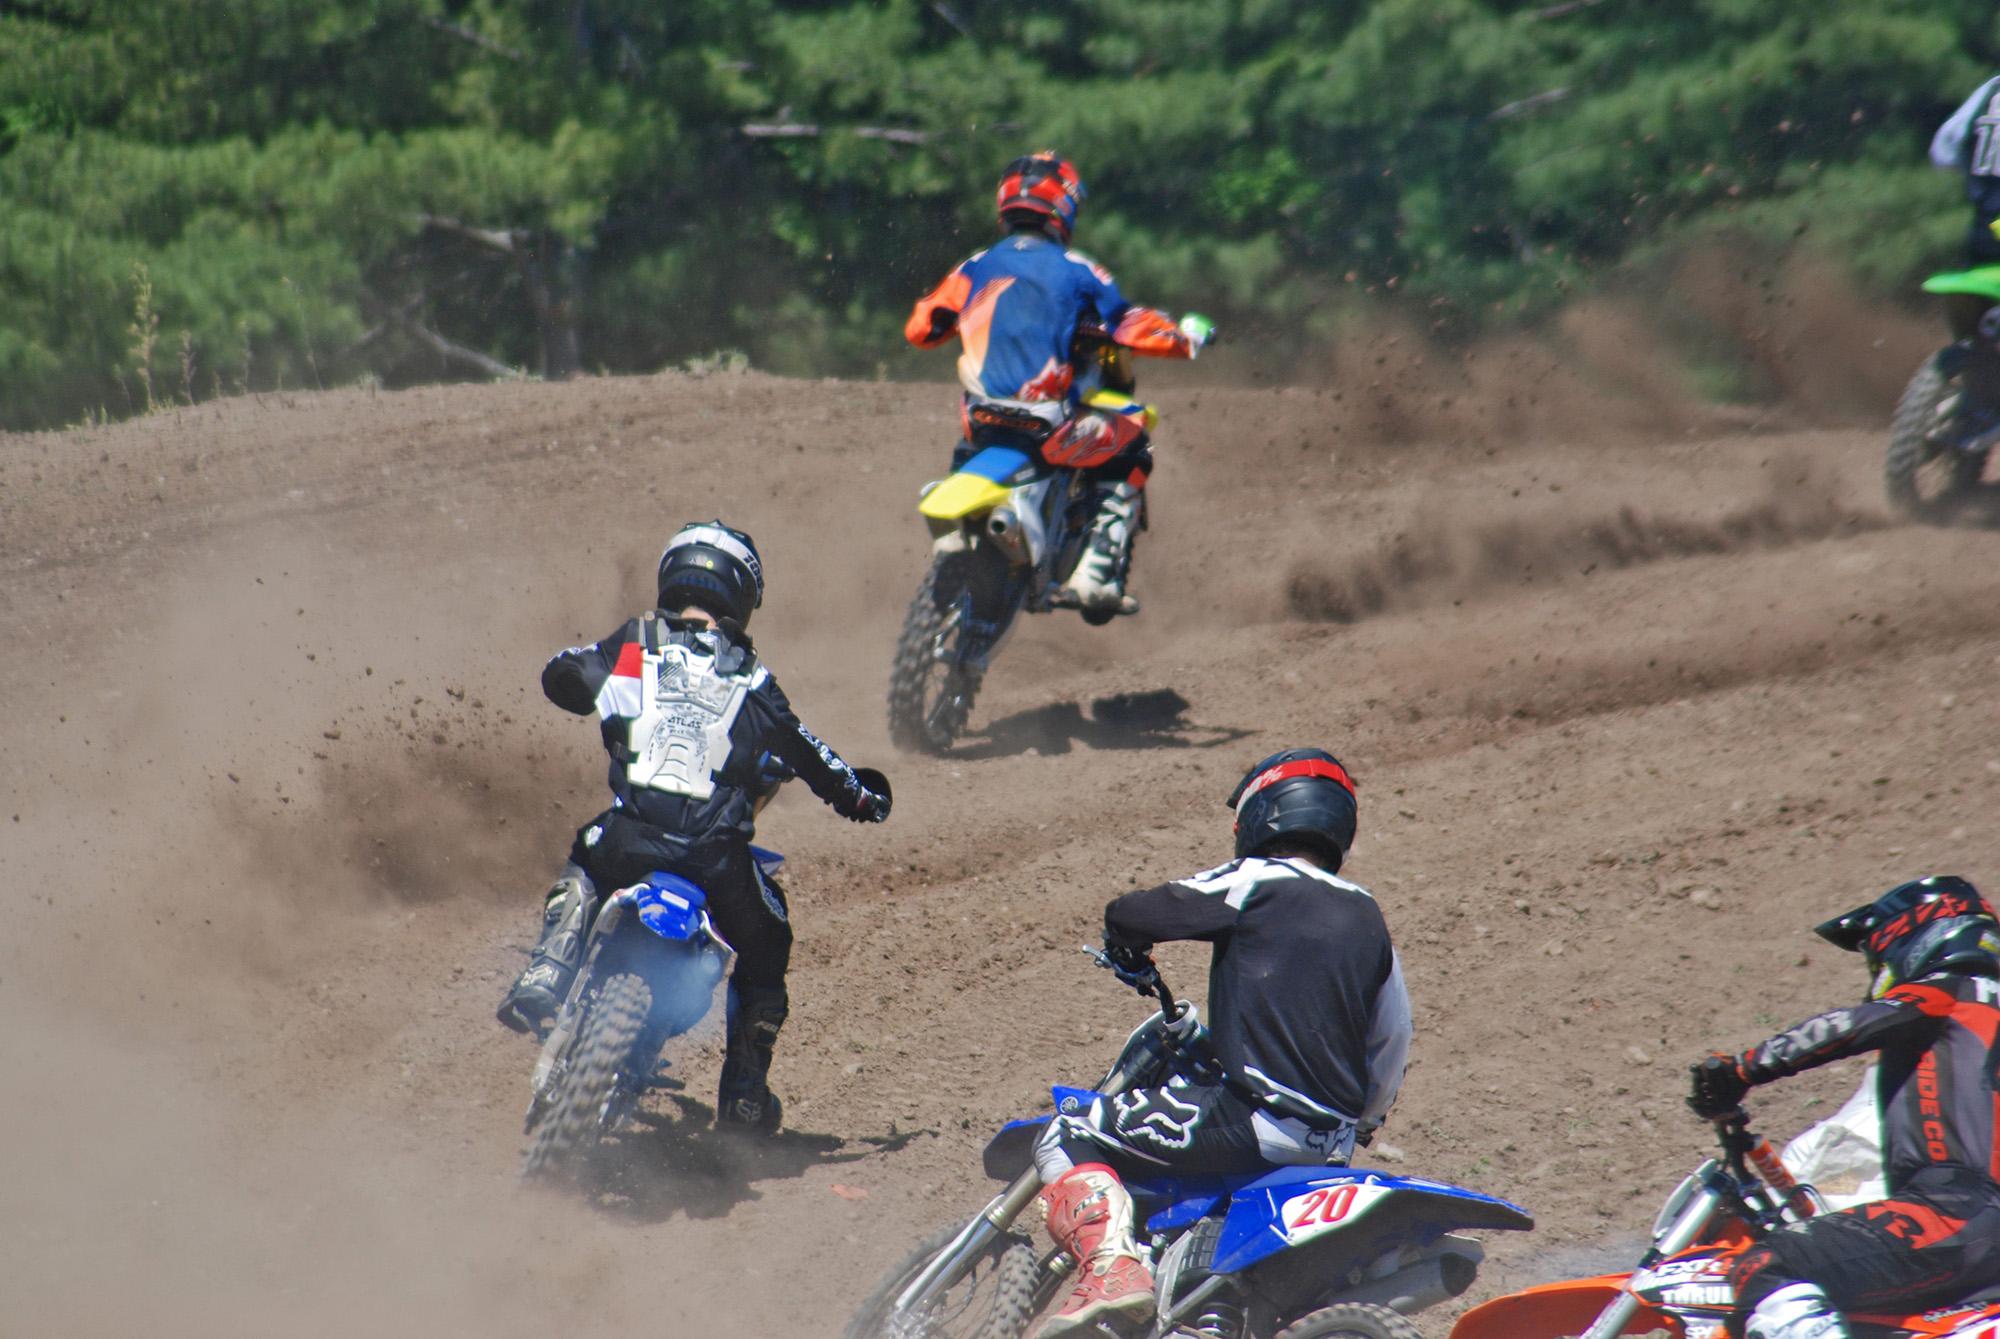 1ST PLACE  – MOTOCROSS  Photographer: Clara Hopkins  Photo Description: Motocross Fun-MMRS racing at the Madoc Fairgrounds.